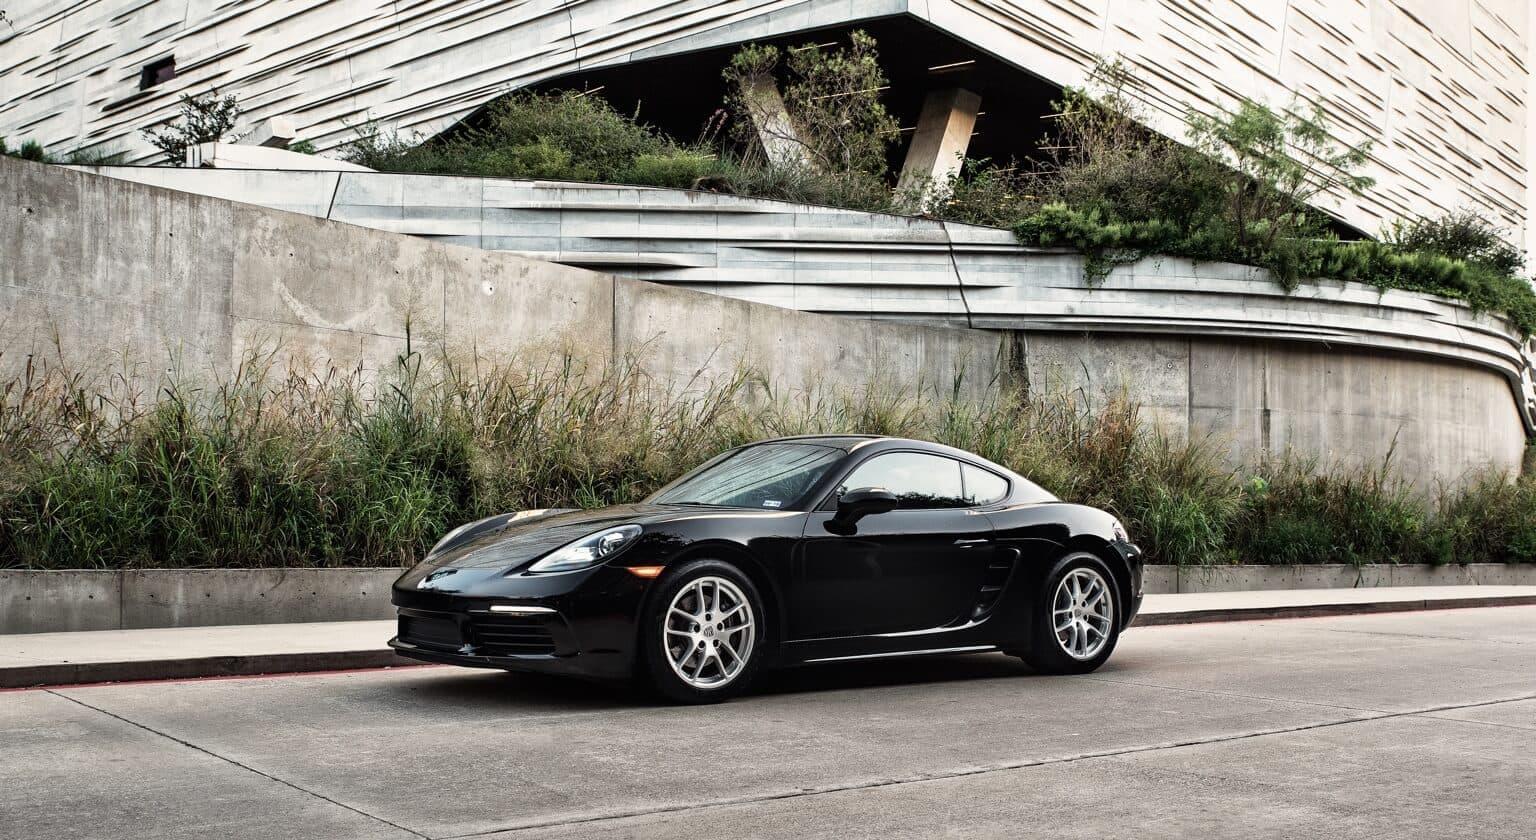 Exotic Luxury Car Rentals In Dallas Tx Turo